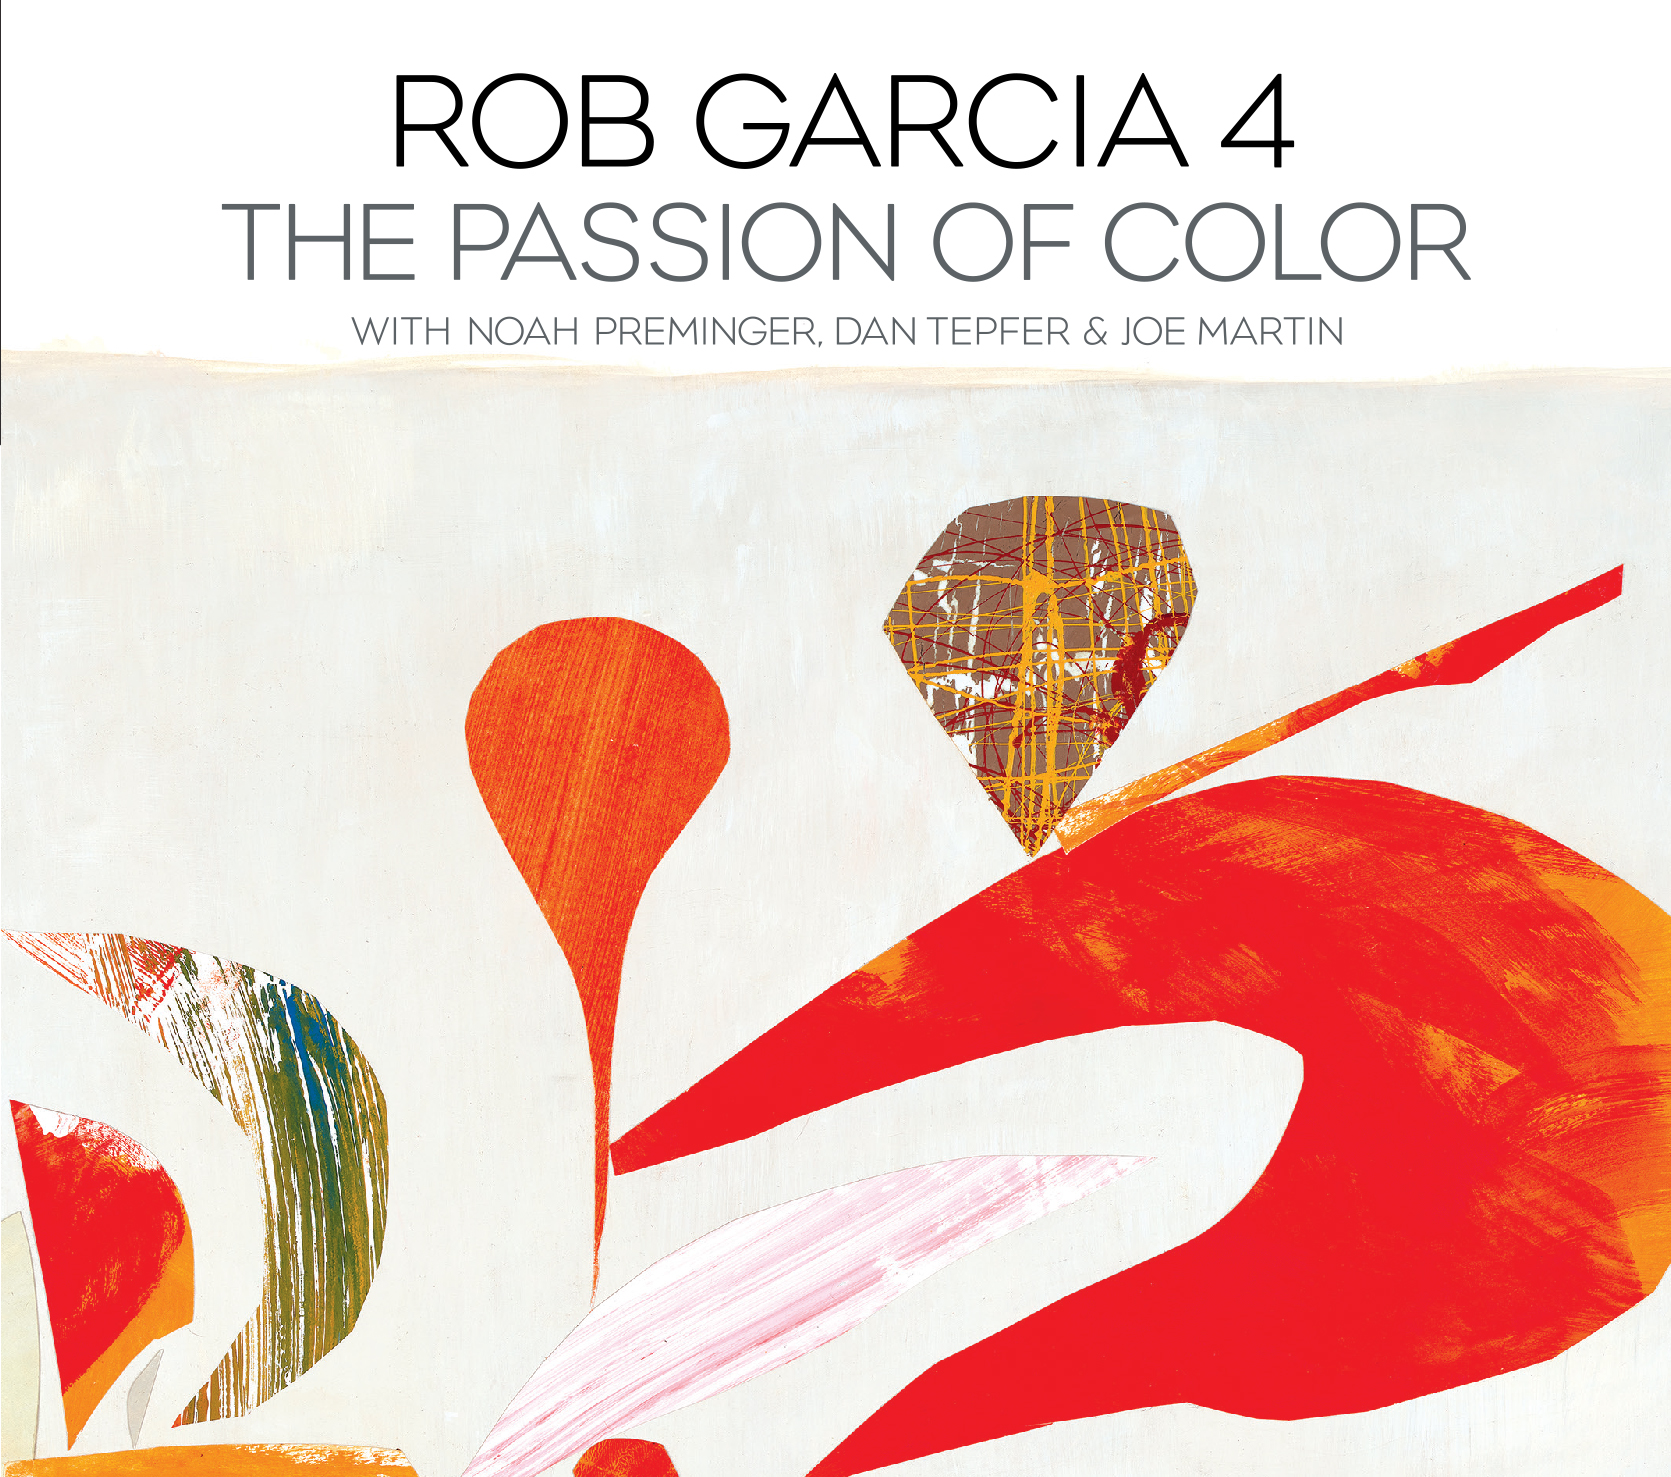 RG4_Passion_Cover.jpg